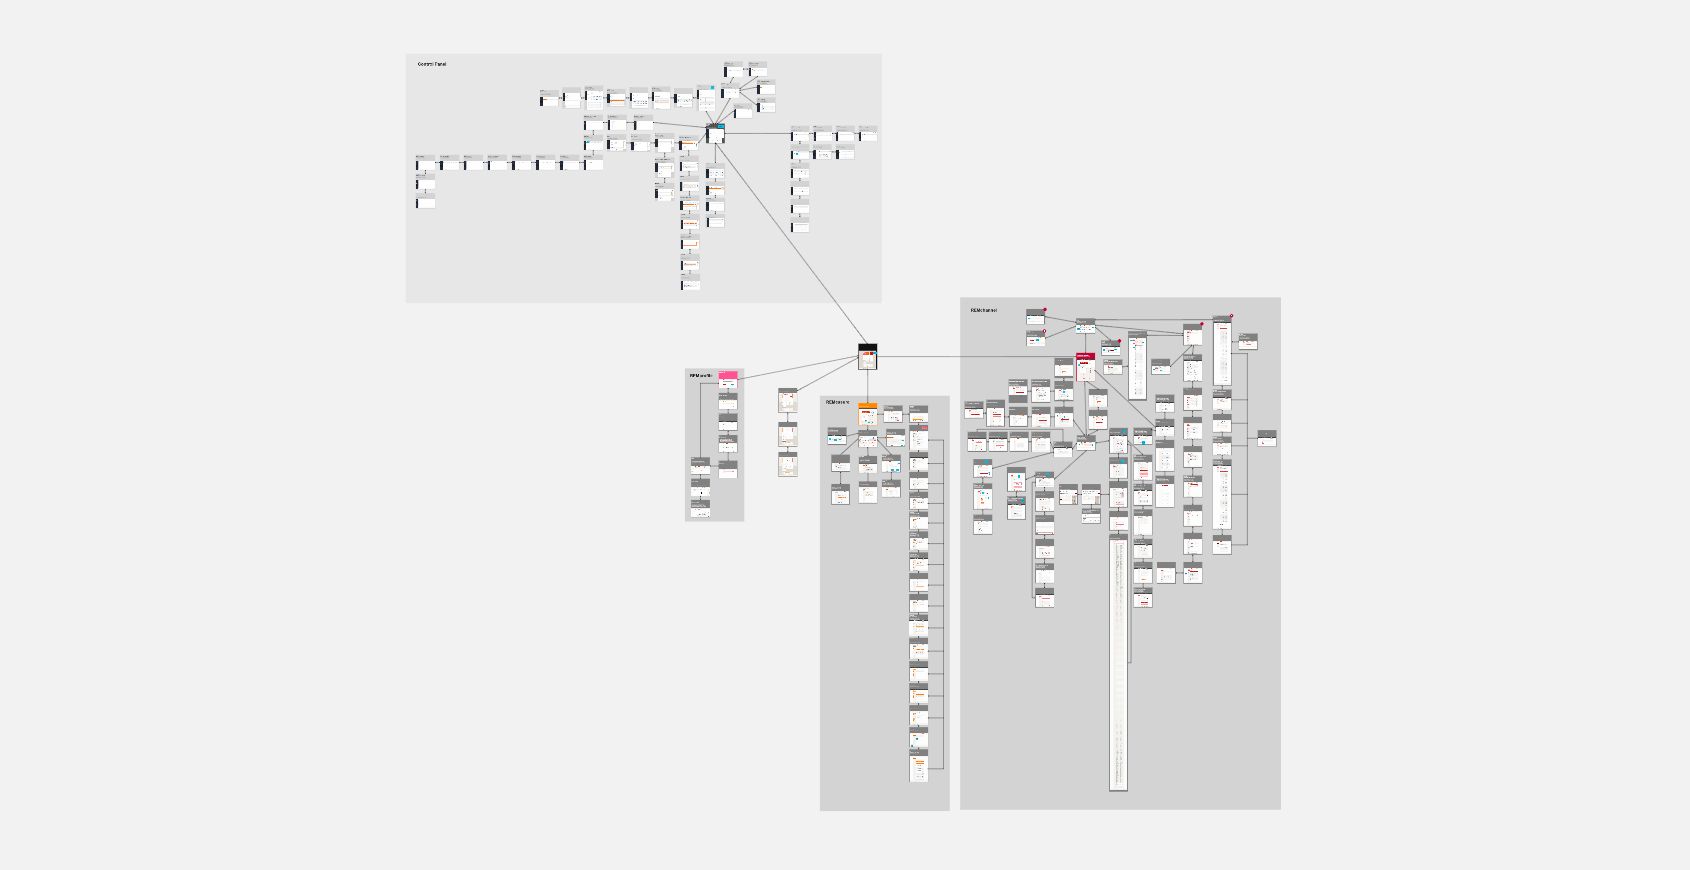 System Map - by Freelance UX designer Mandy Robinson